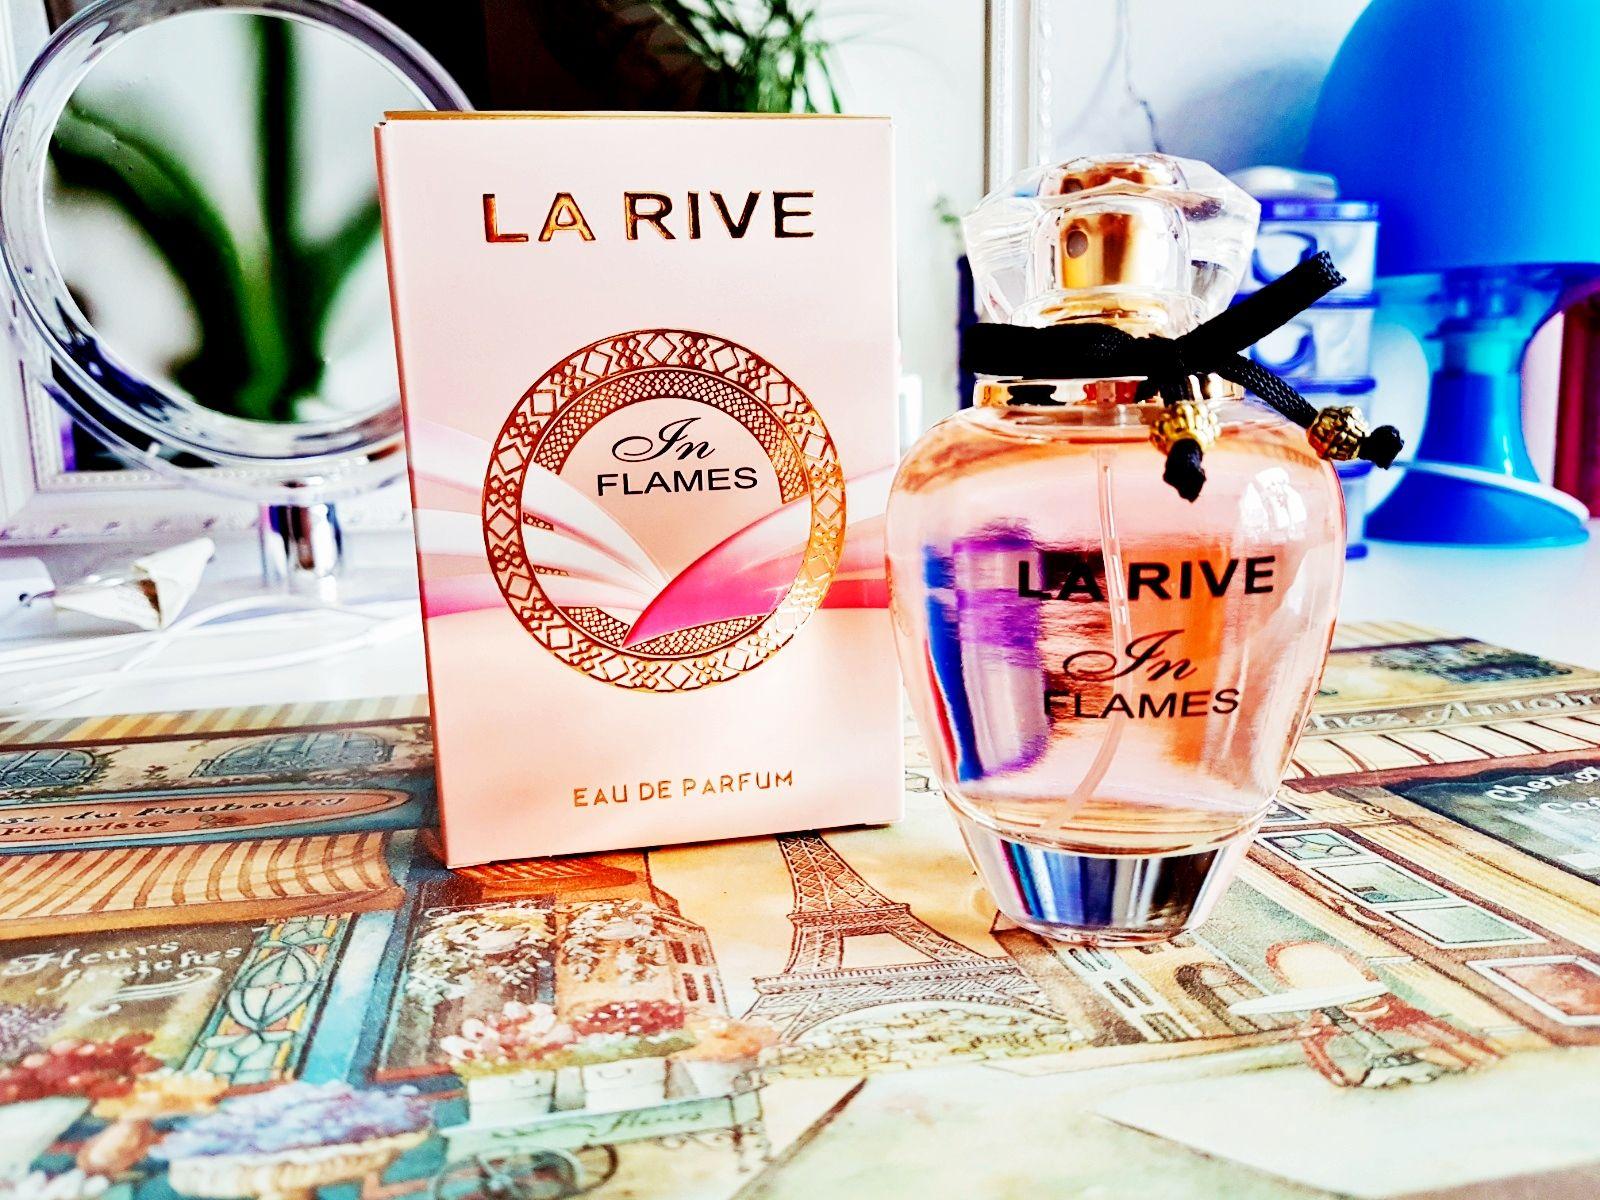 La Rive in Flames Parfum